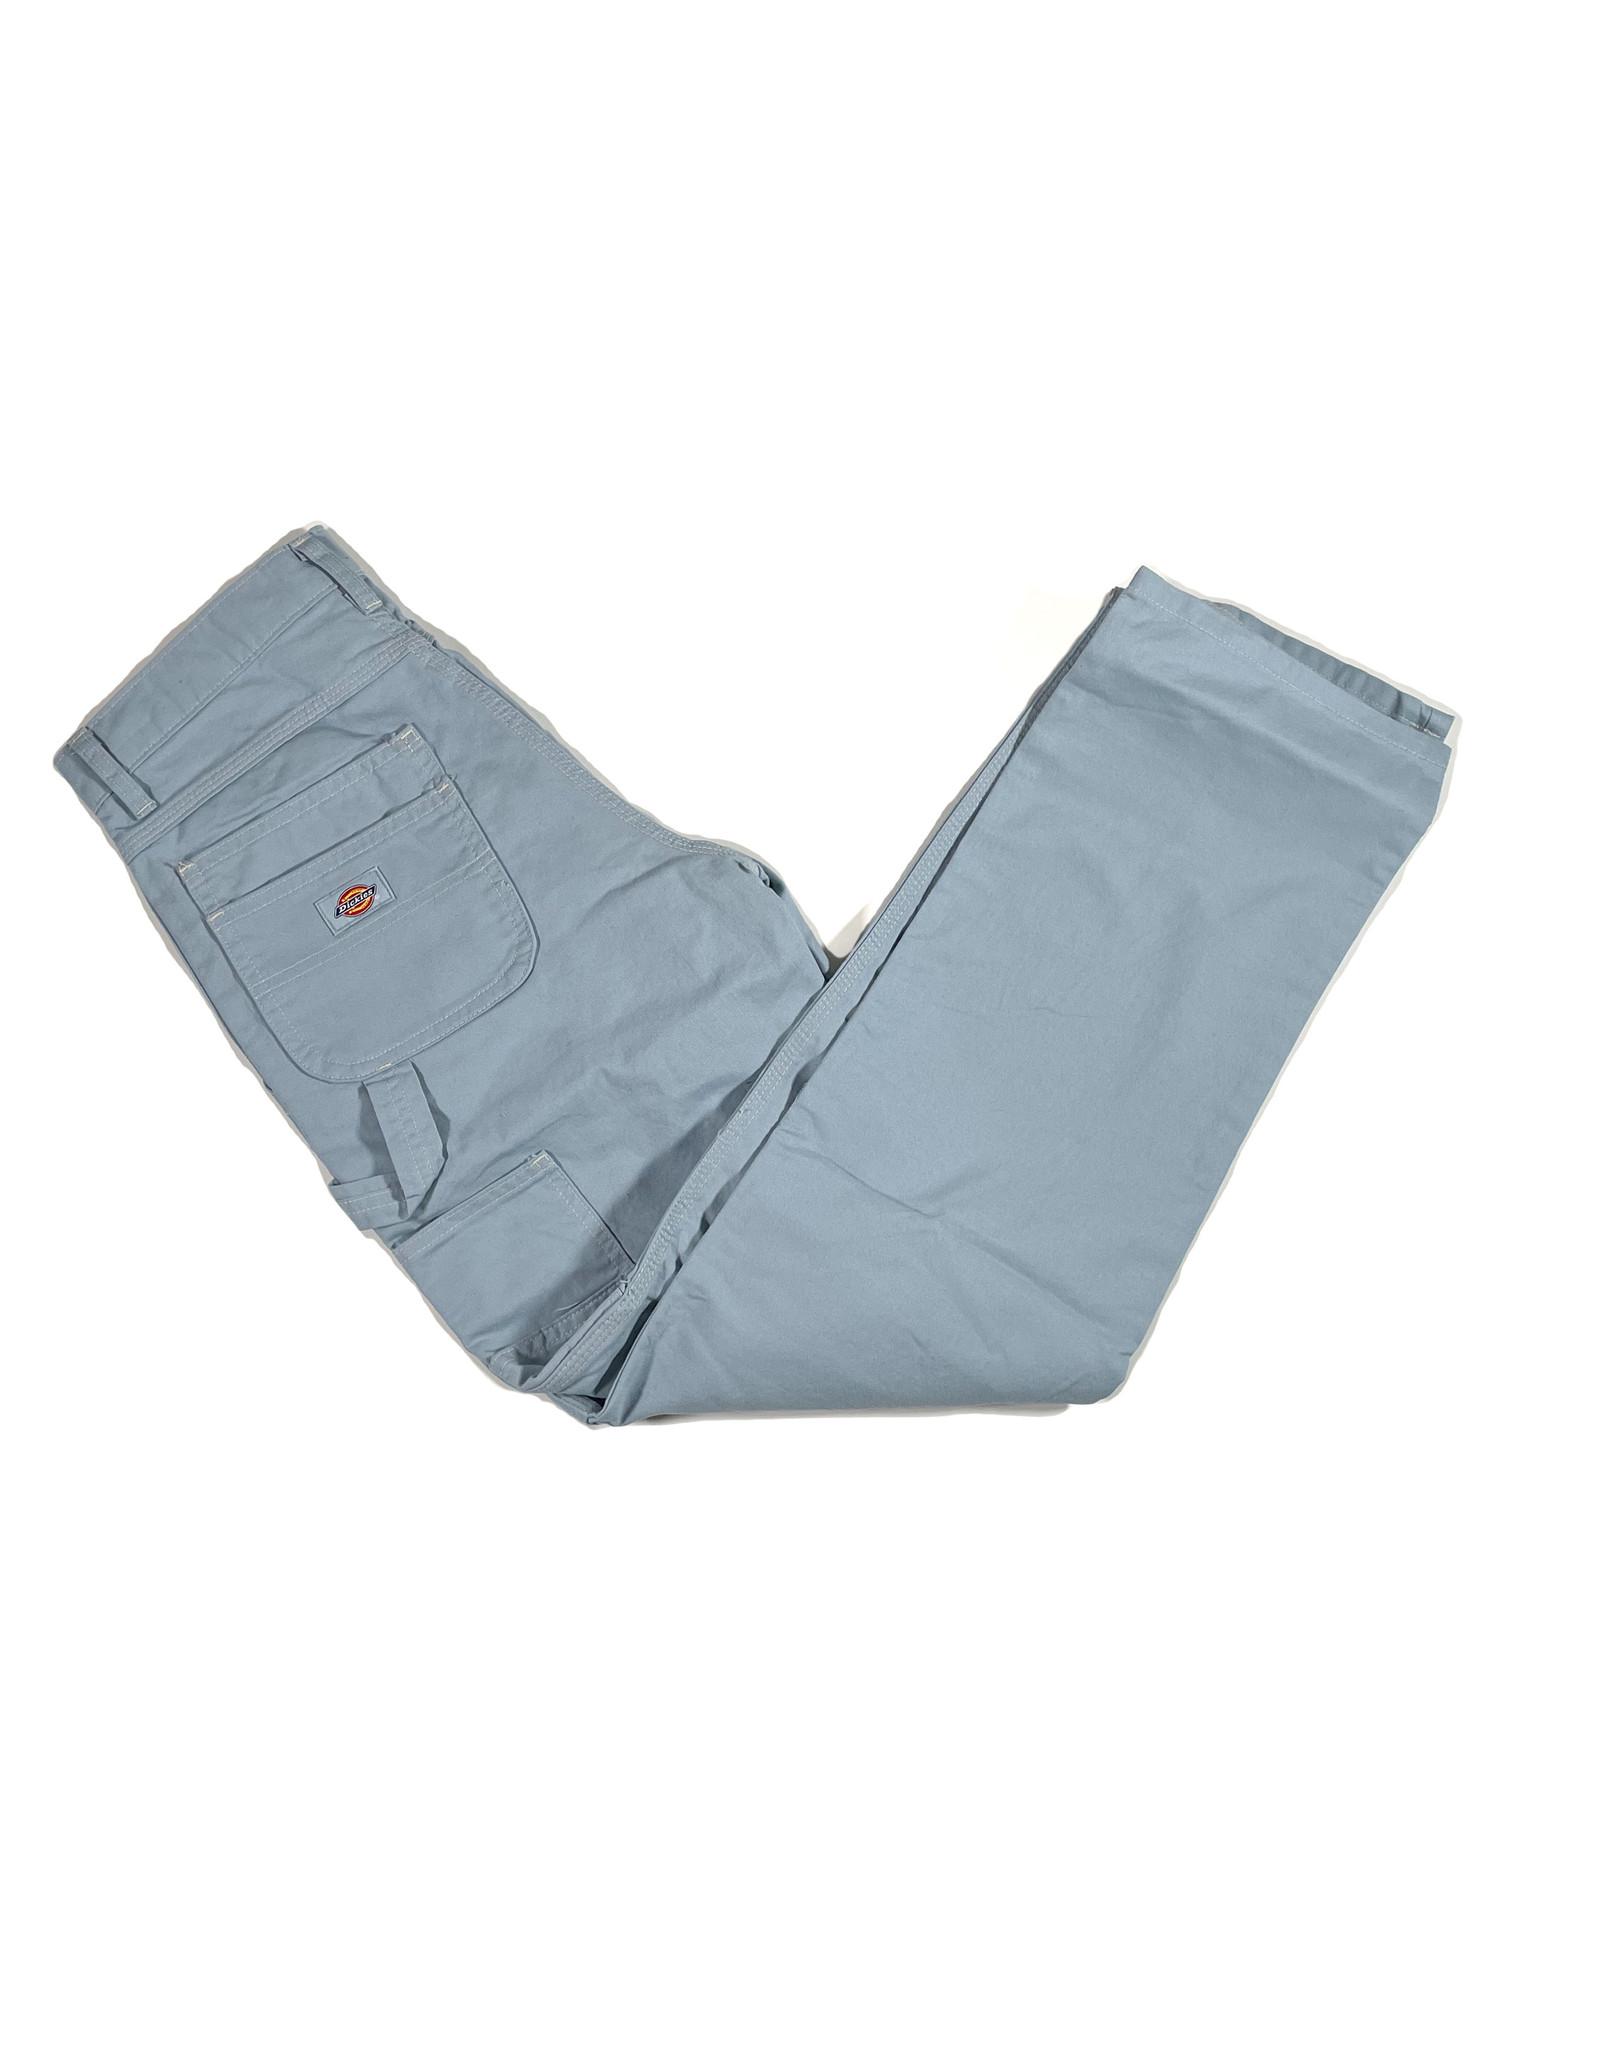 DICKIES DICKIES SUSTAINABLE WASHED UTILITY PANTS - STONEWASHED FOG BLUE